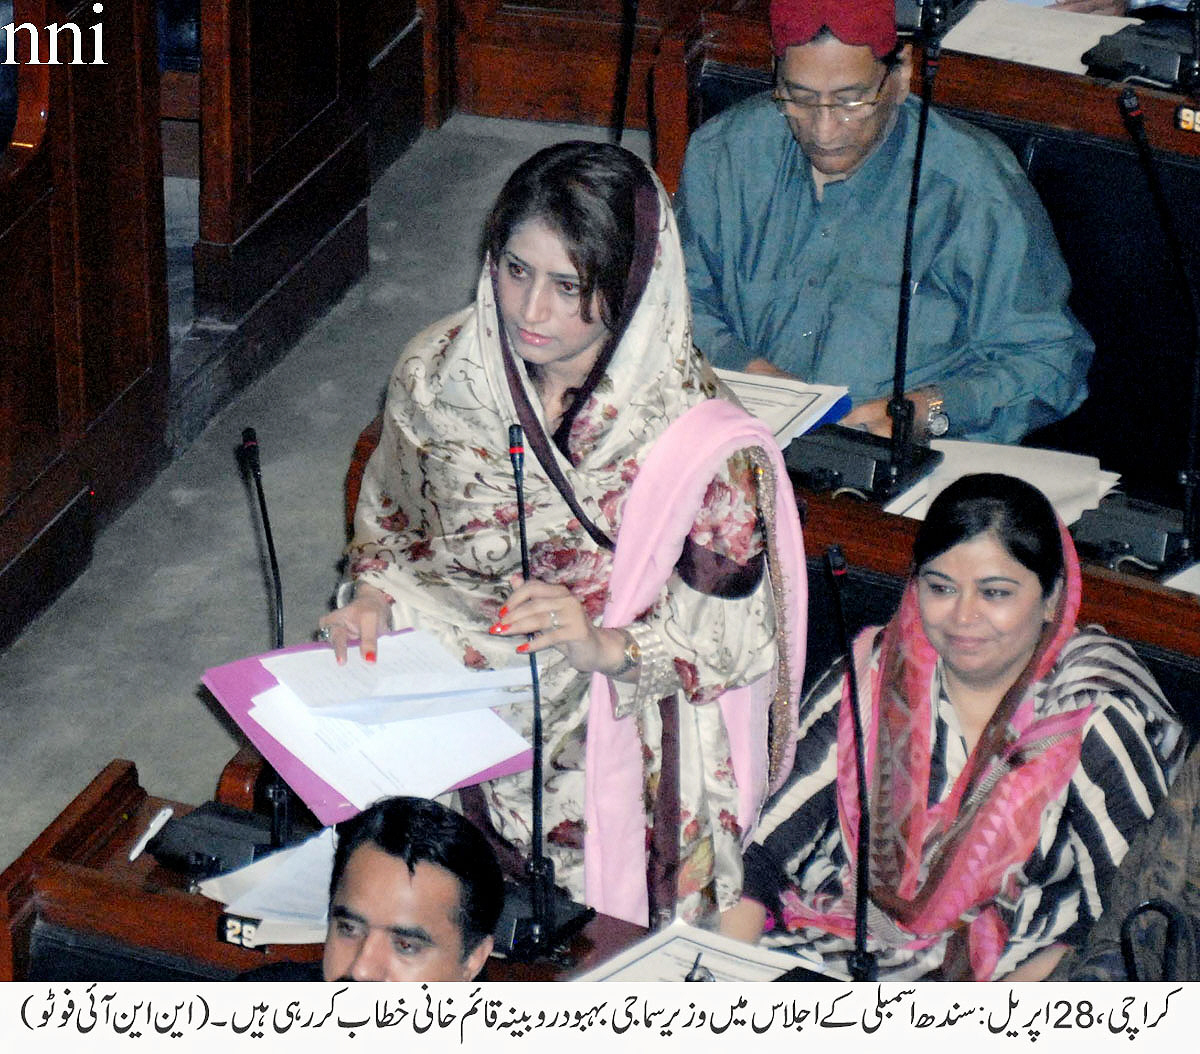 Rubina Saadat Qaimkhani, who is also the minister for social welfare and women development, presented teh bill along with Sharmila Farooqui. PHOTO: NNI